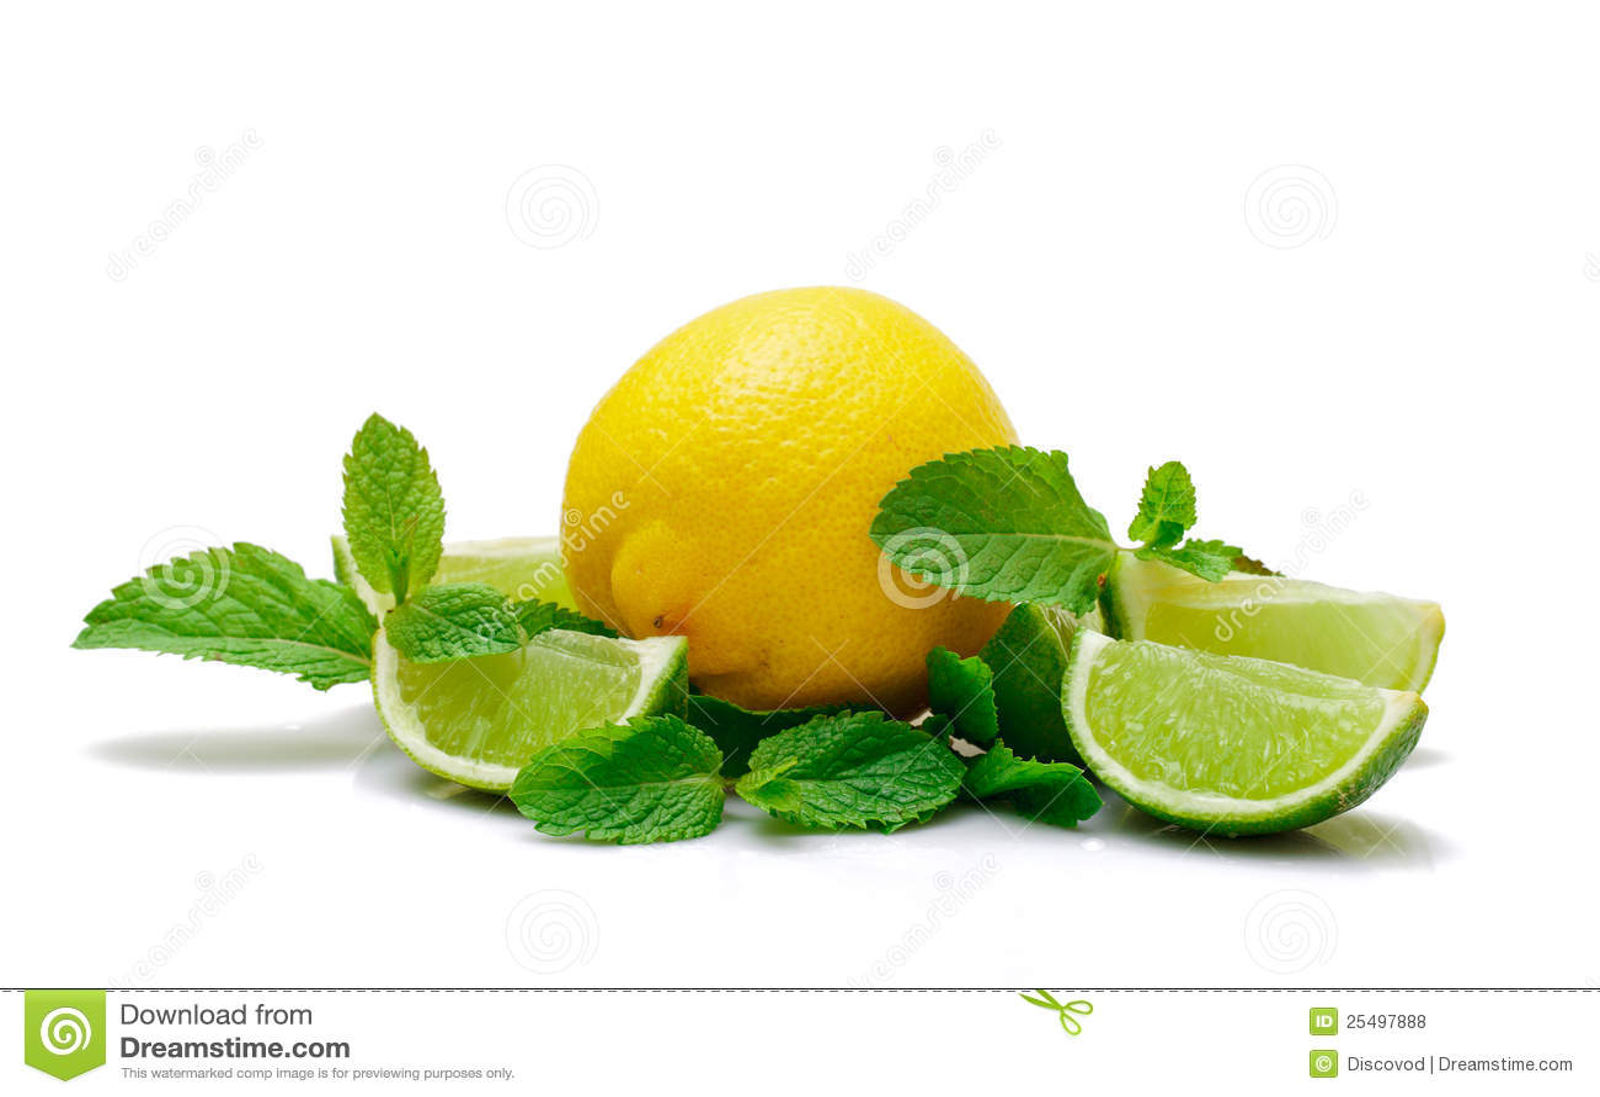 Fresh Lemon, Lime and Mint